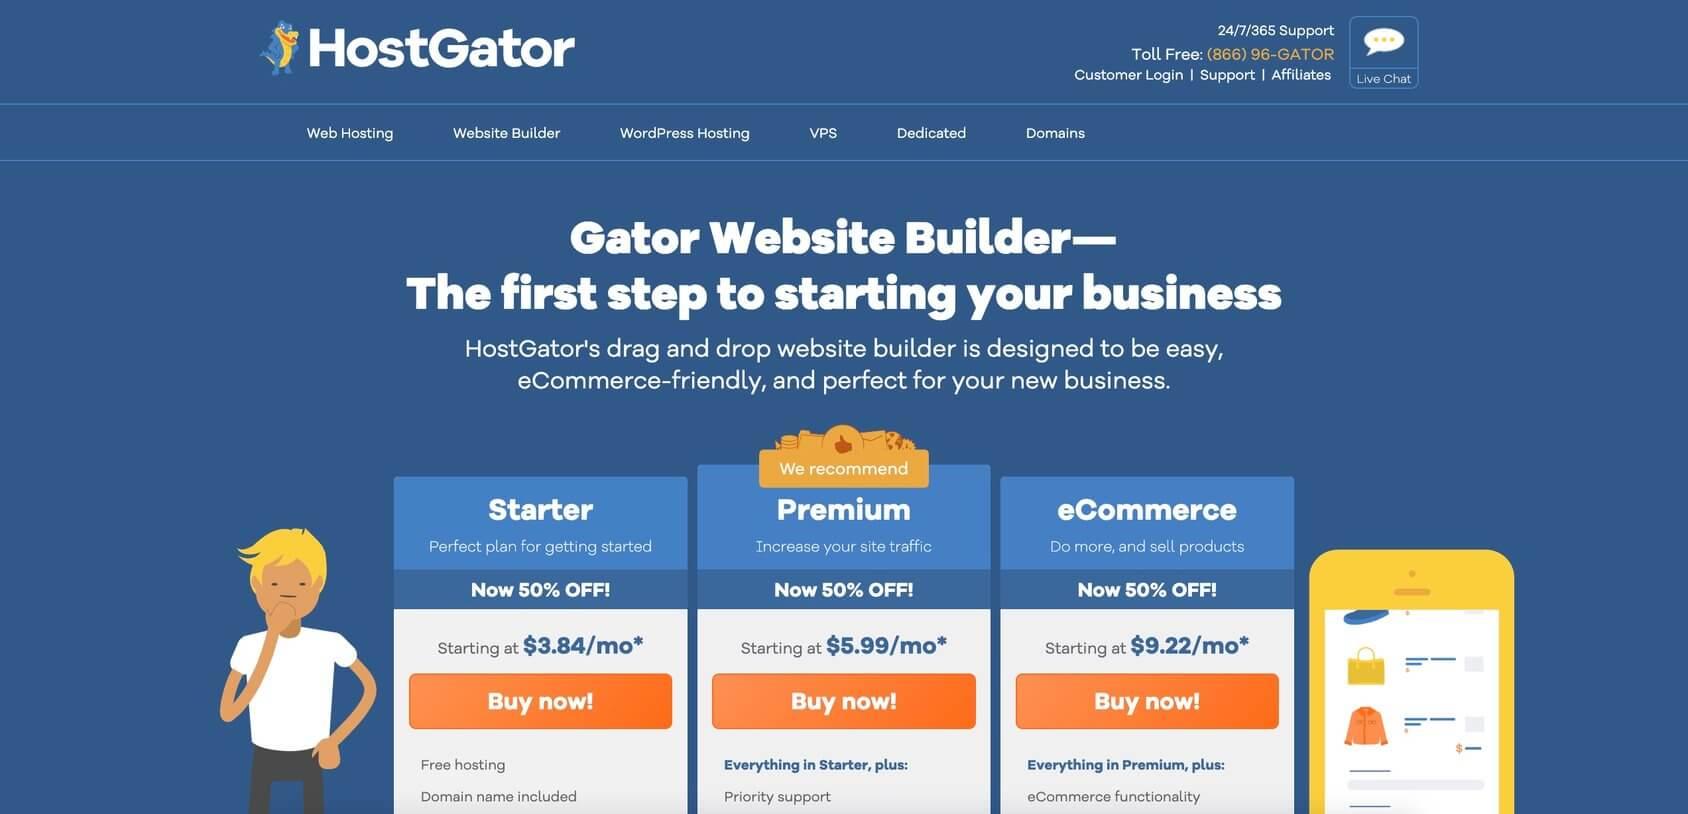 Gator homepage